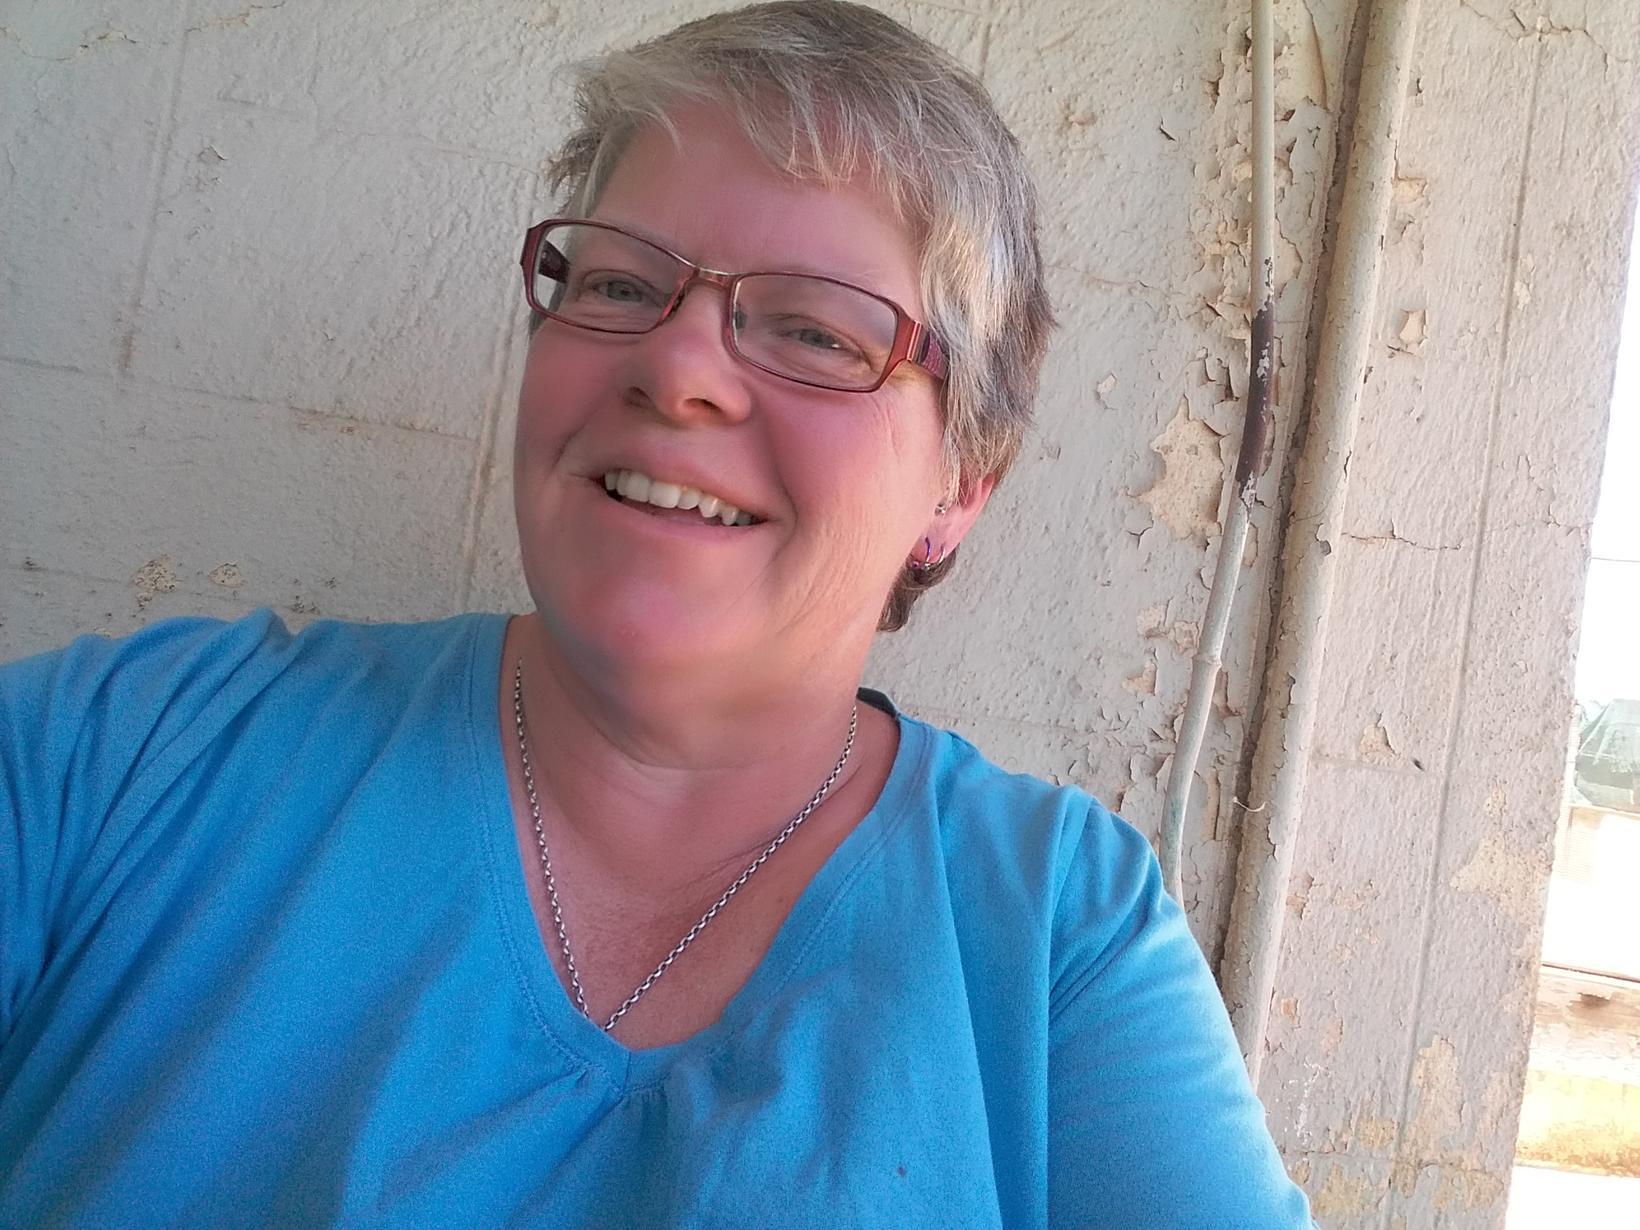 Cj from Adelaide, South Australia, Australia